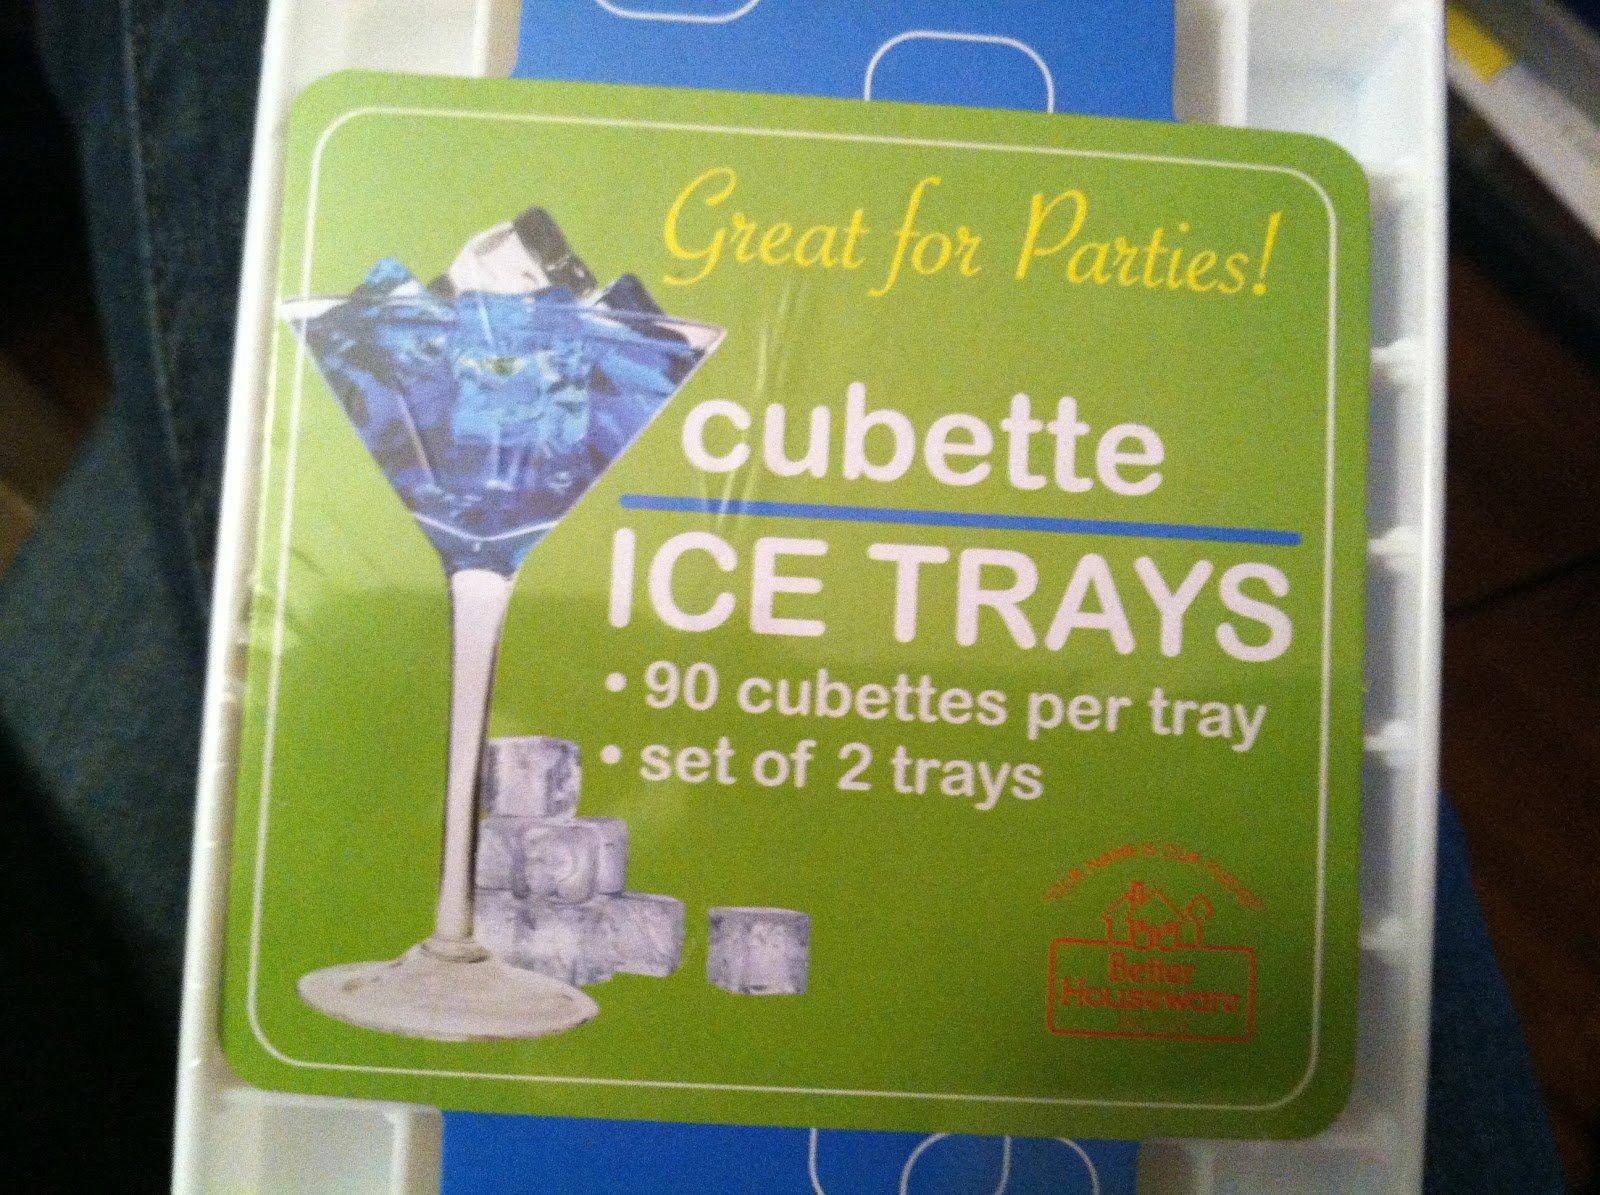 4 X Cubette Mini Ice Cube Trays (Set of 4, White) by Rovel